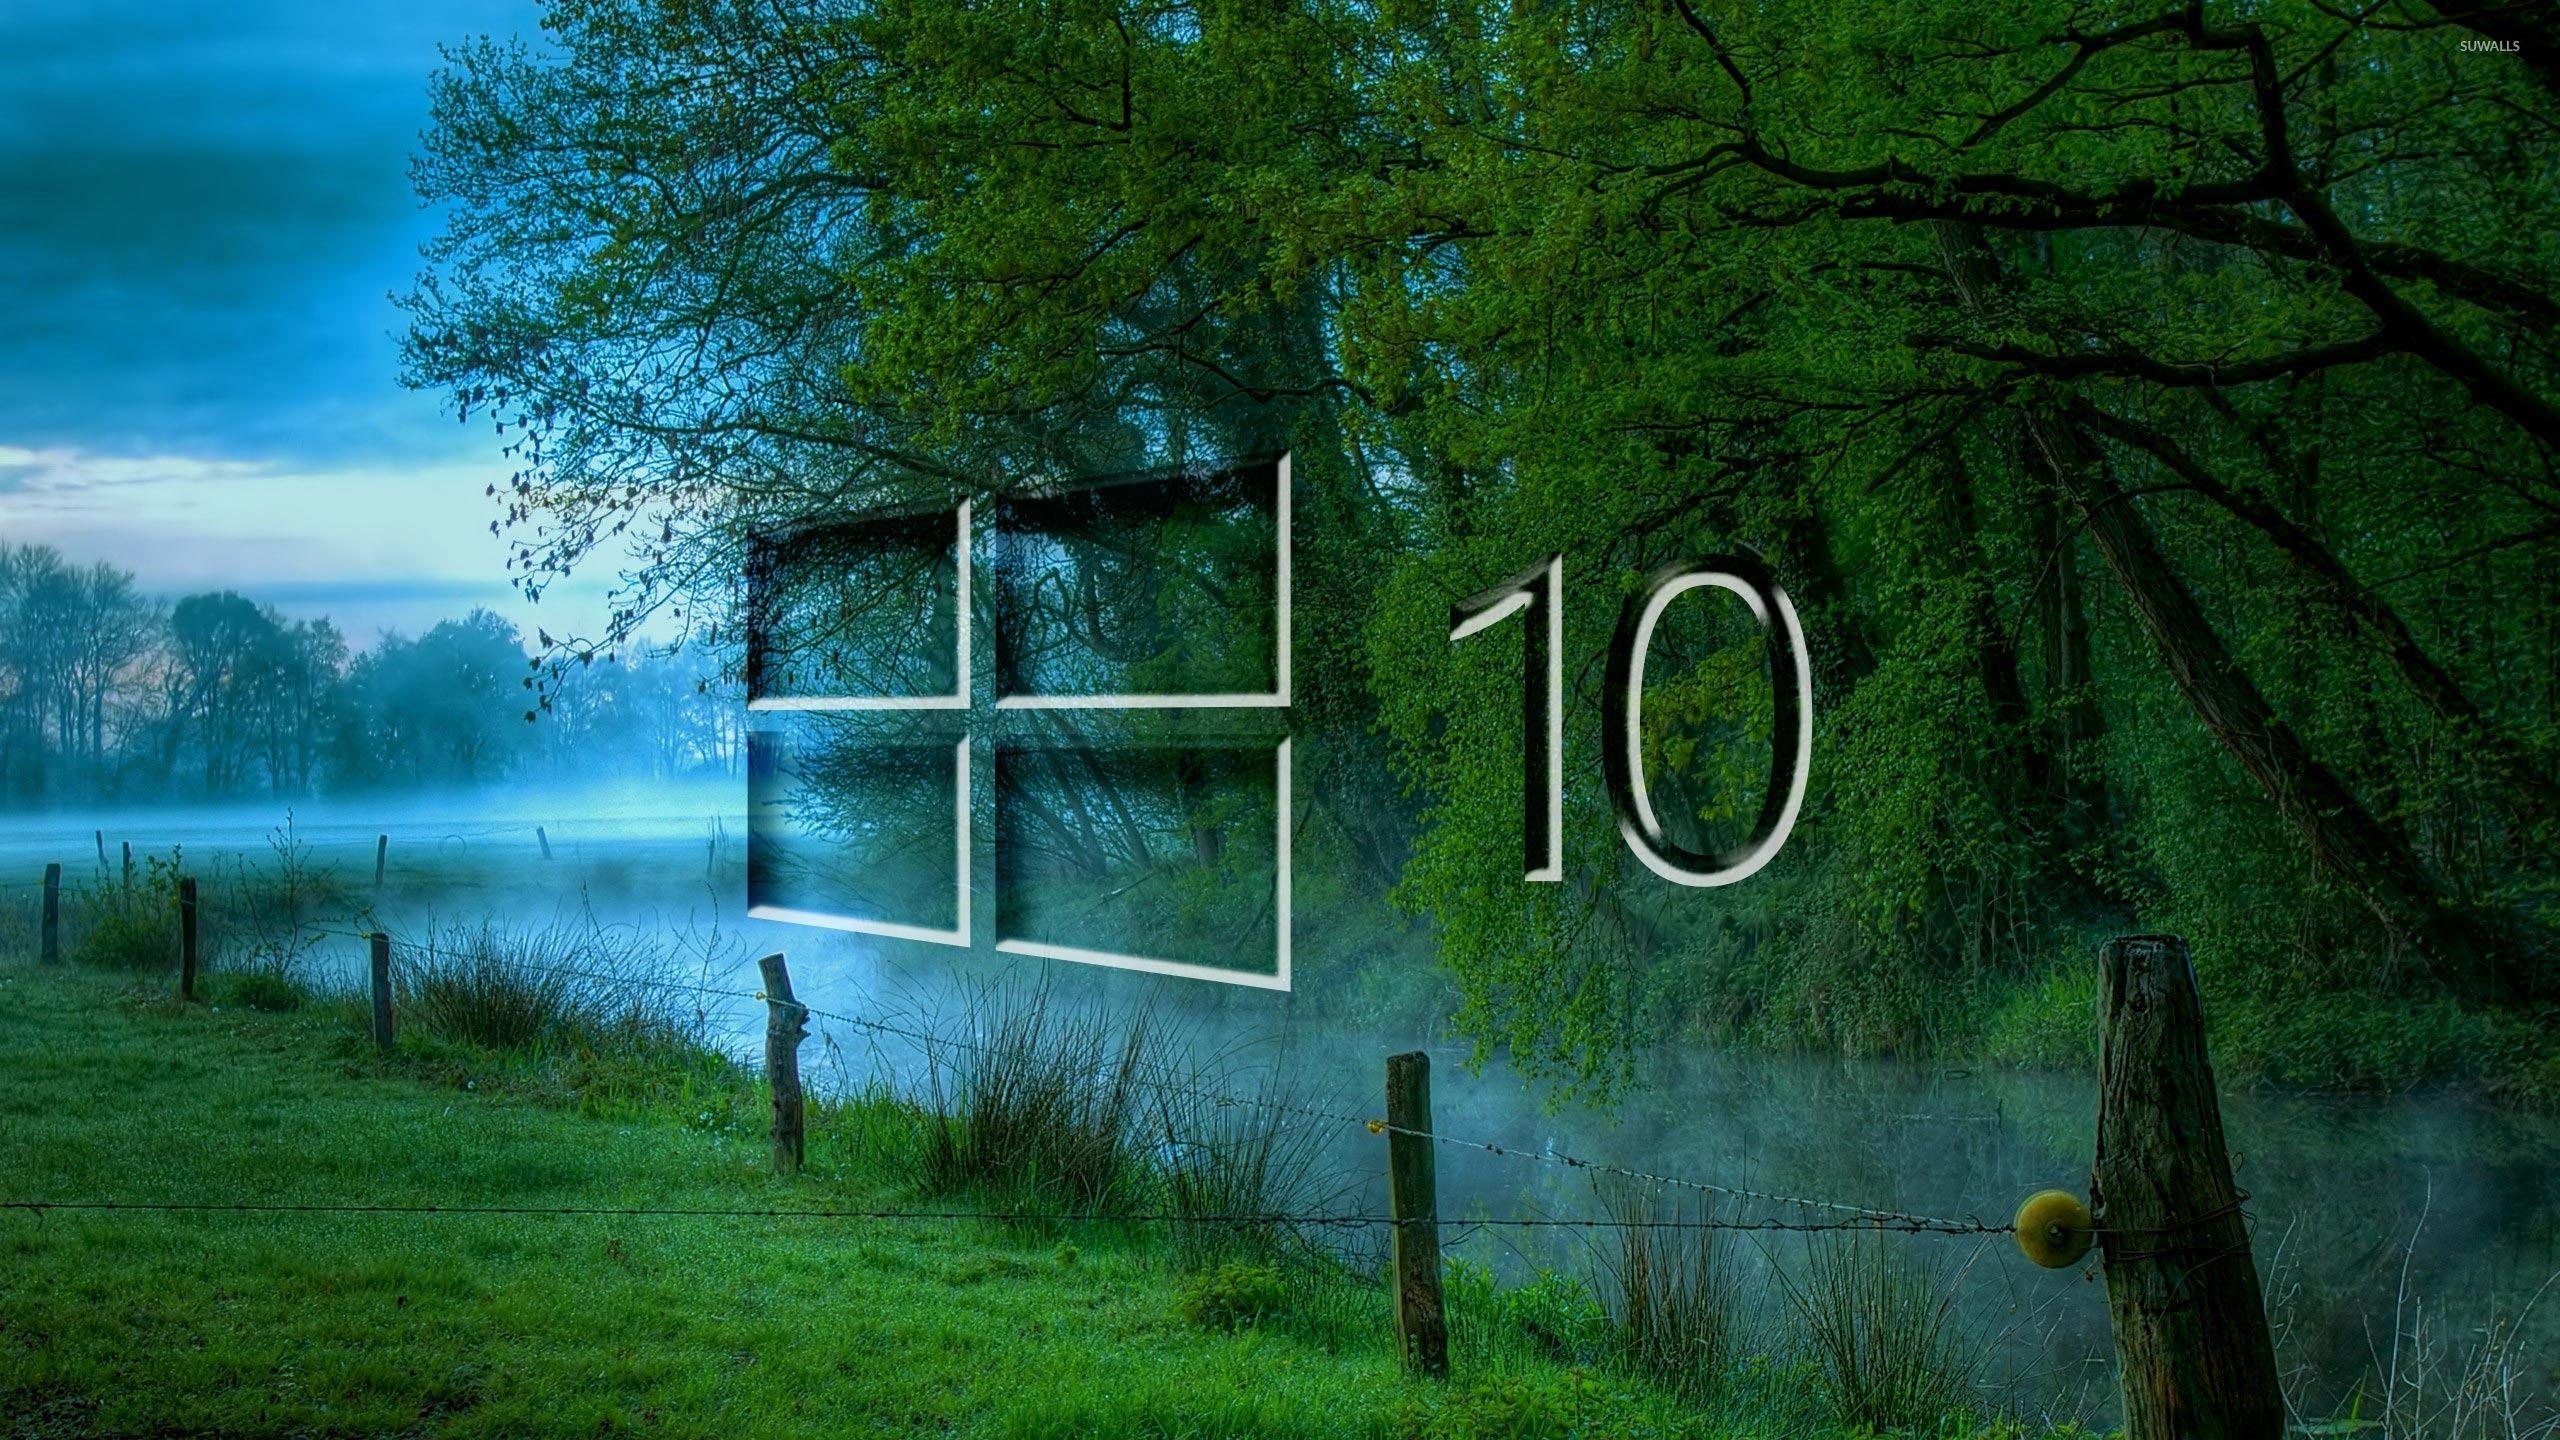 2560x1440 Wallpaper Windows 10  WallpaperSafari